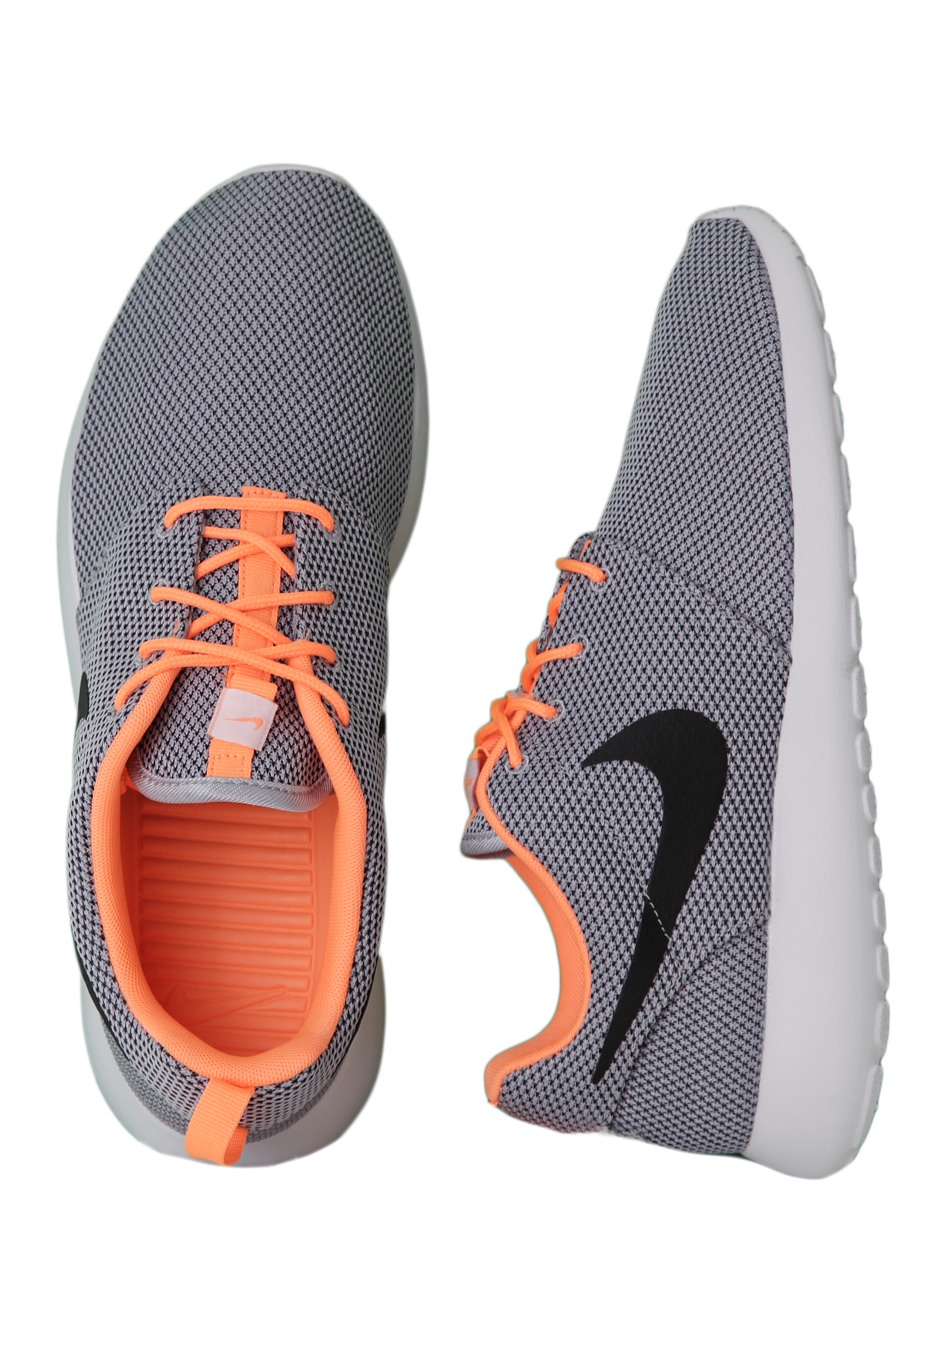 best sneakers 6dc4e ab5a5 Nike - Roshe Run Wolf Grey/Black/Atomic Orange/White - Shoes -  Impericon.com UK